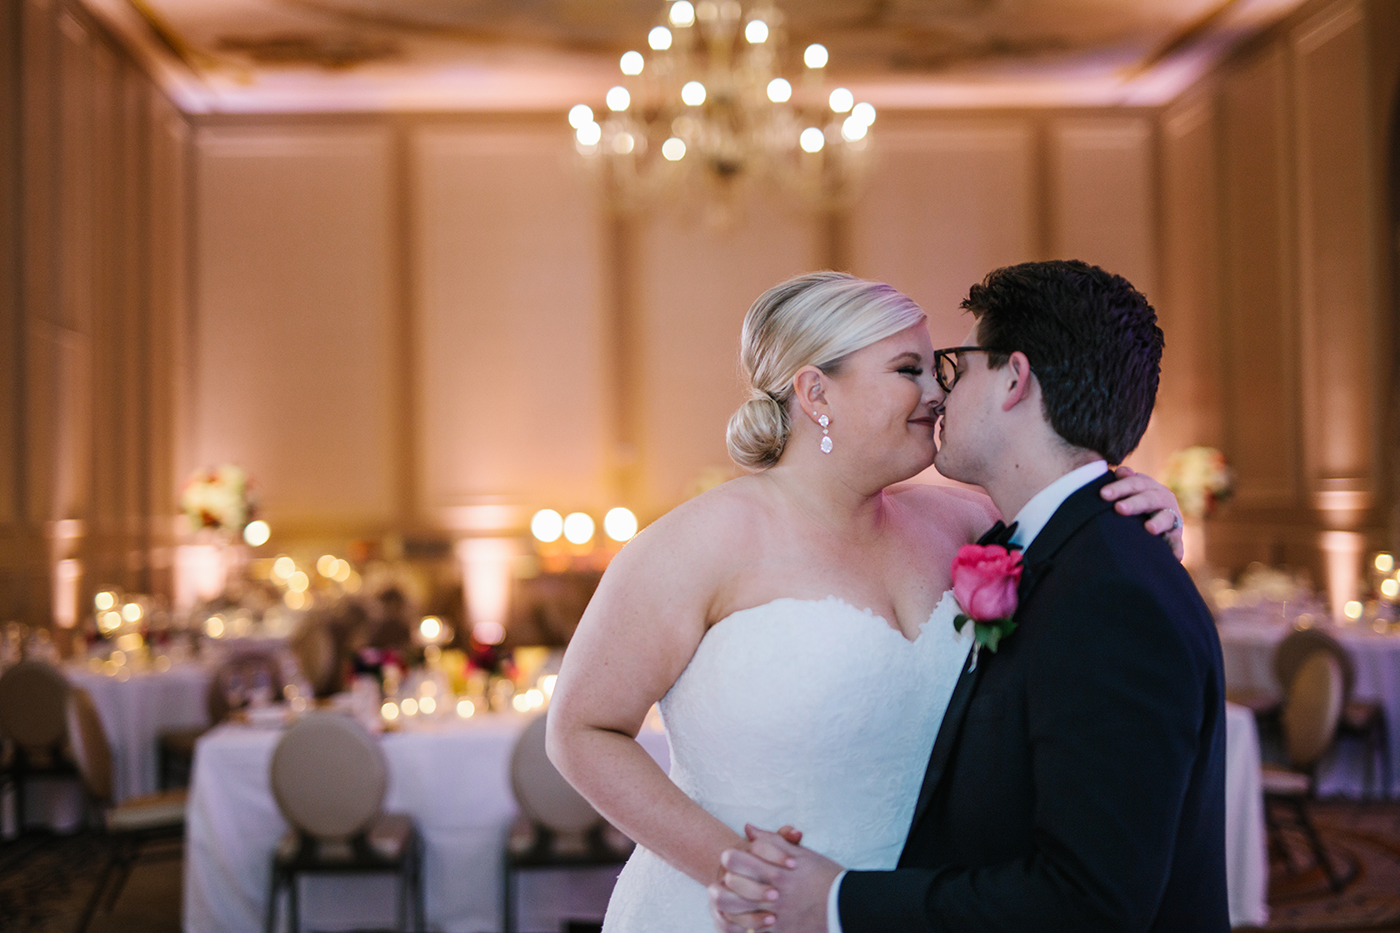 Dallas Weddings Planner - Allday Events - Katie + Matthew at The Adolphus Hotel - 524.jpg